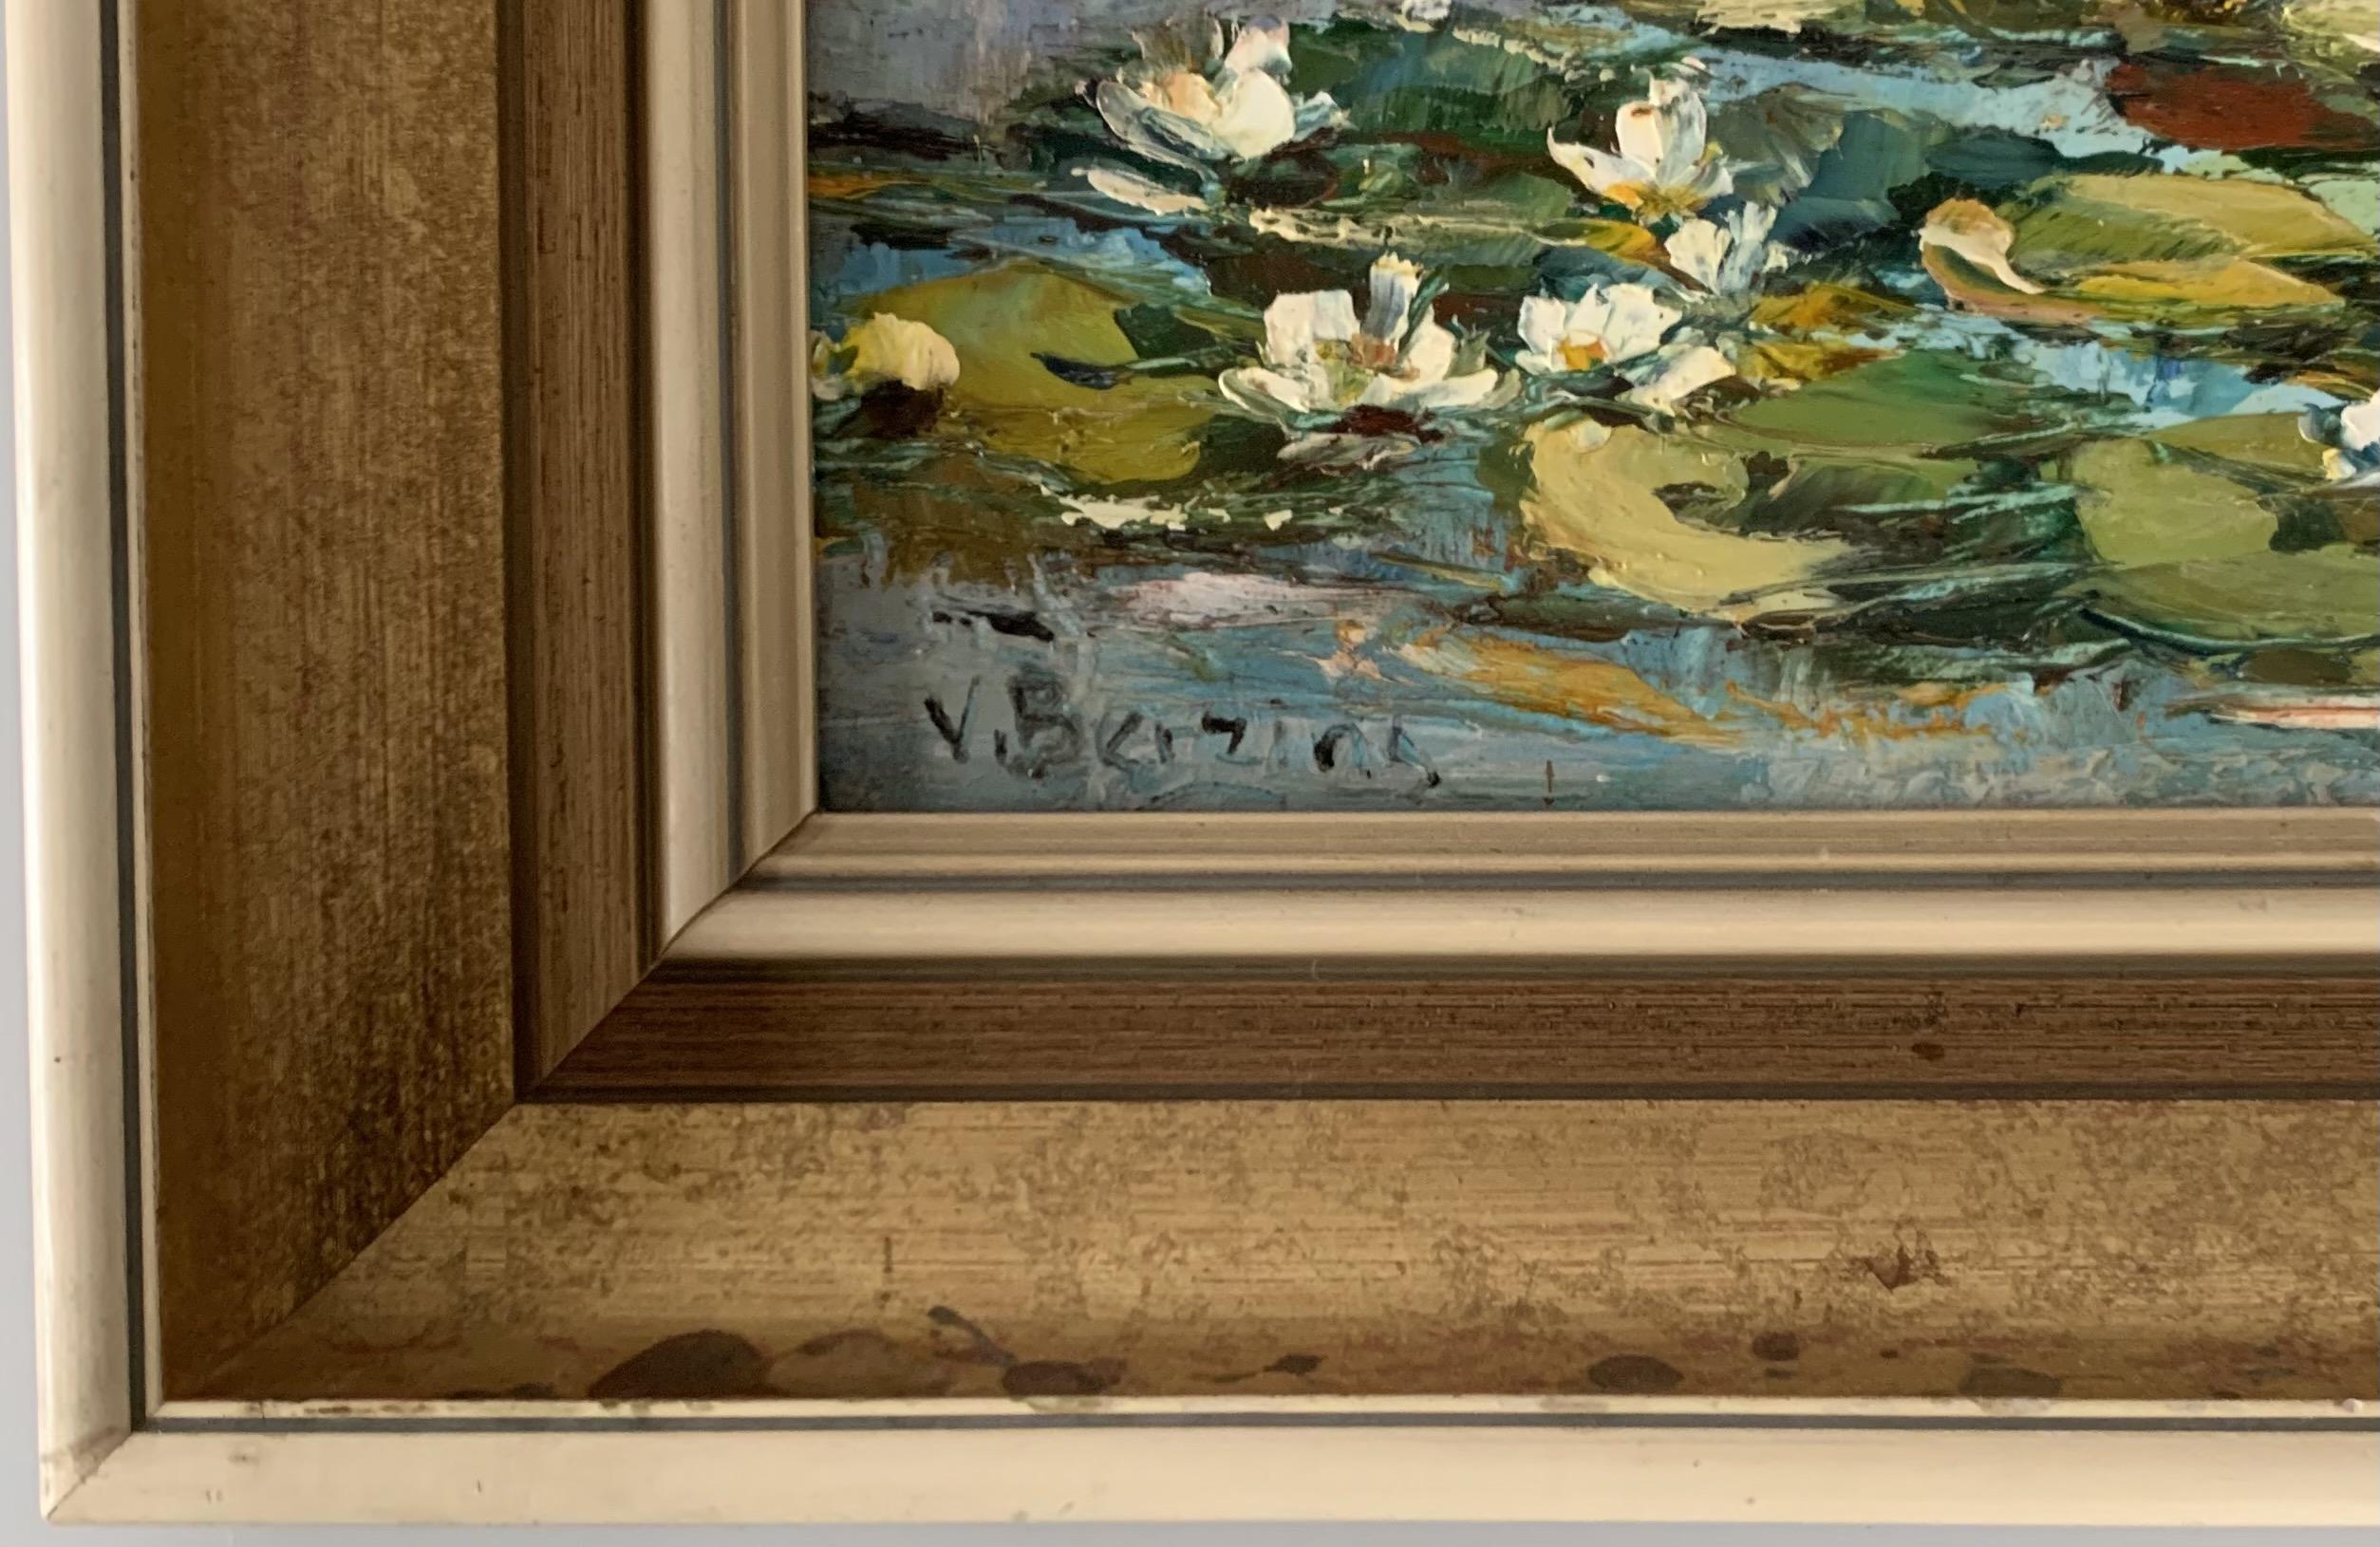 "Oil on board of lily pond by V. Berzins. Image 10"" x 13"", frame 15.5"" x 18.5"". - Image 2 of 3"